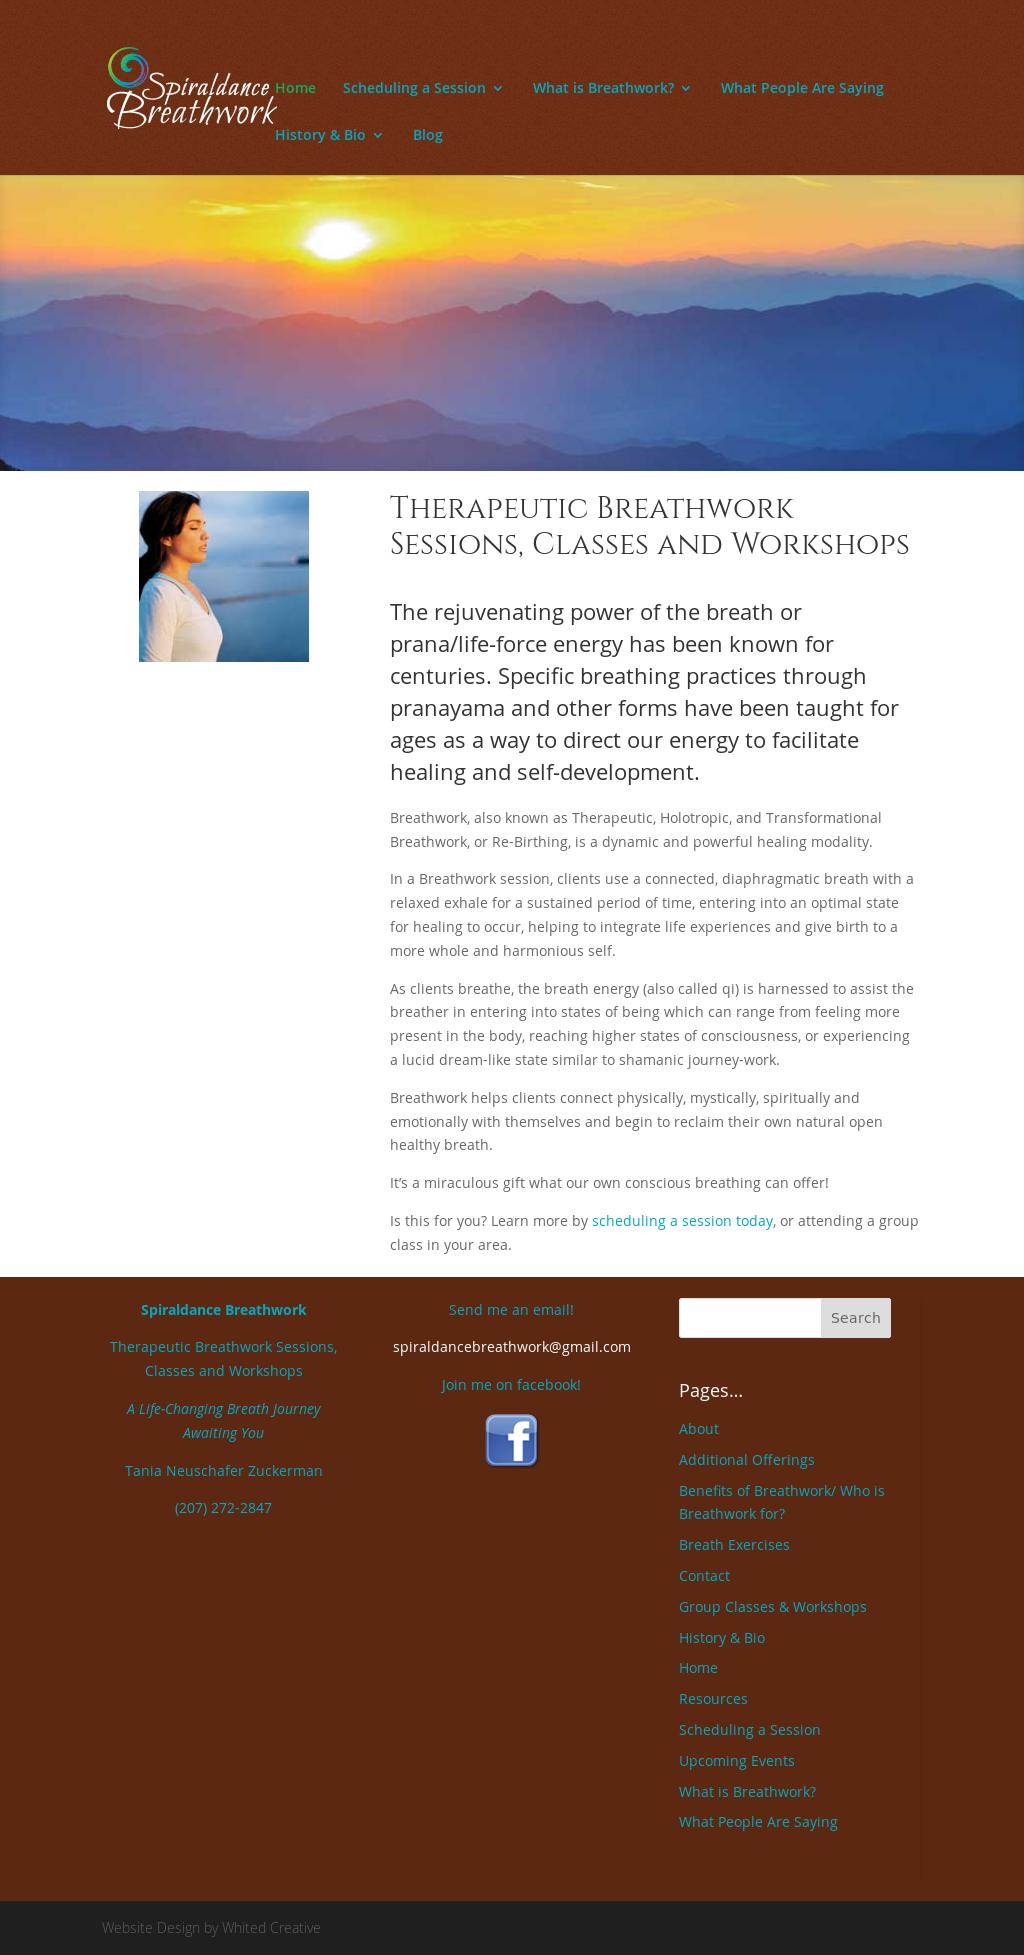 Spiraldance Breathwork Competitors, Revenue and Employees